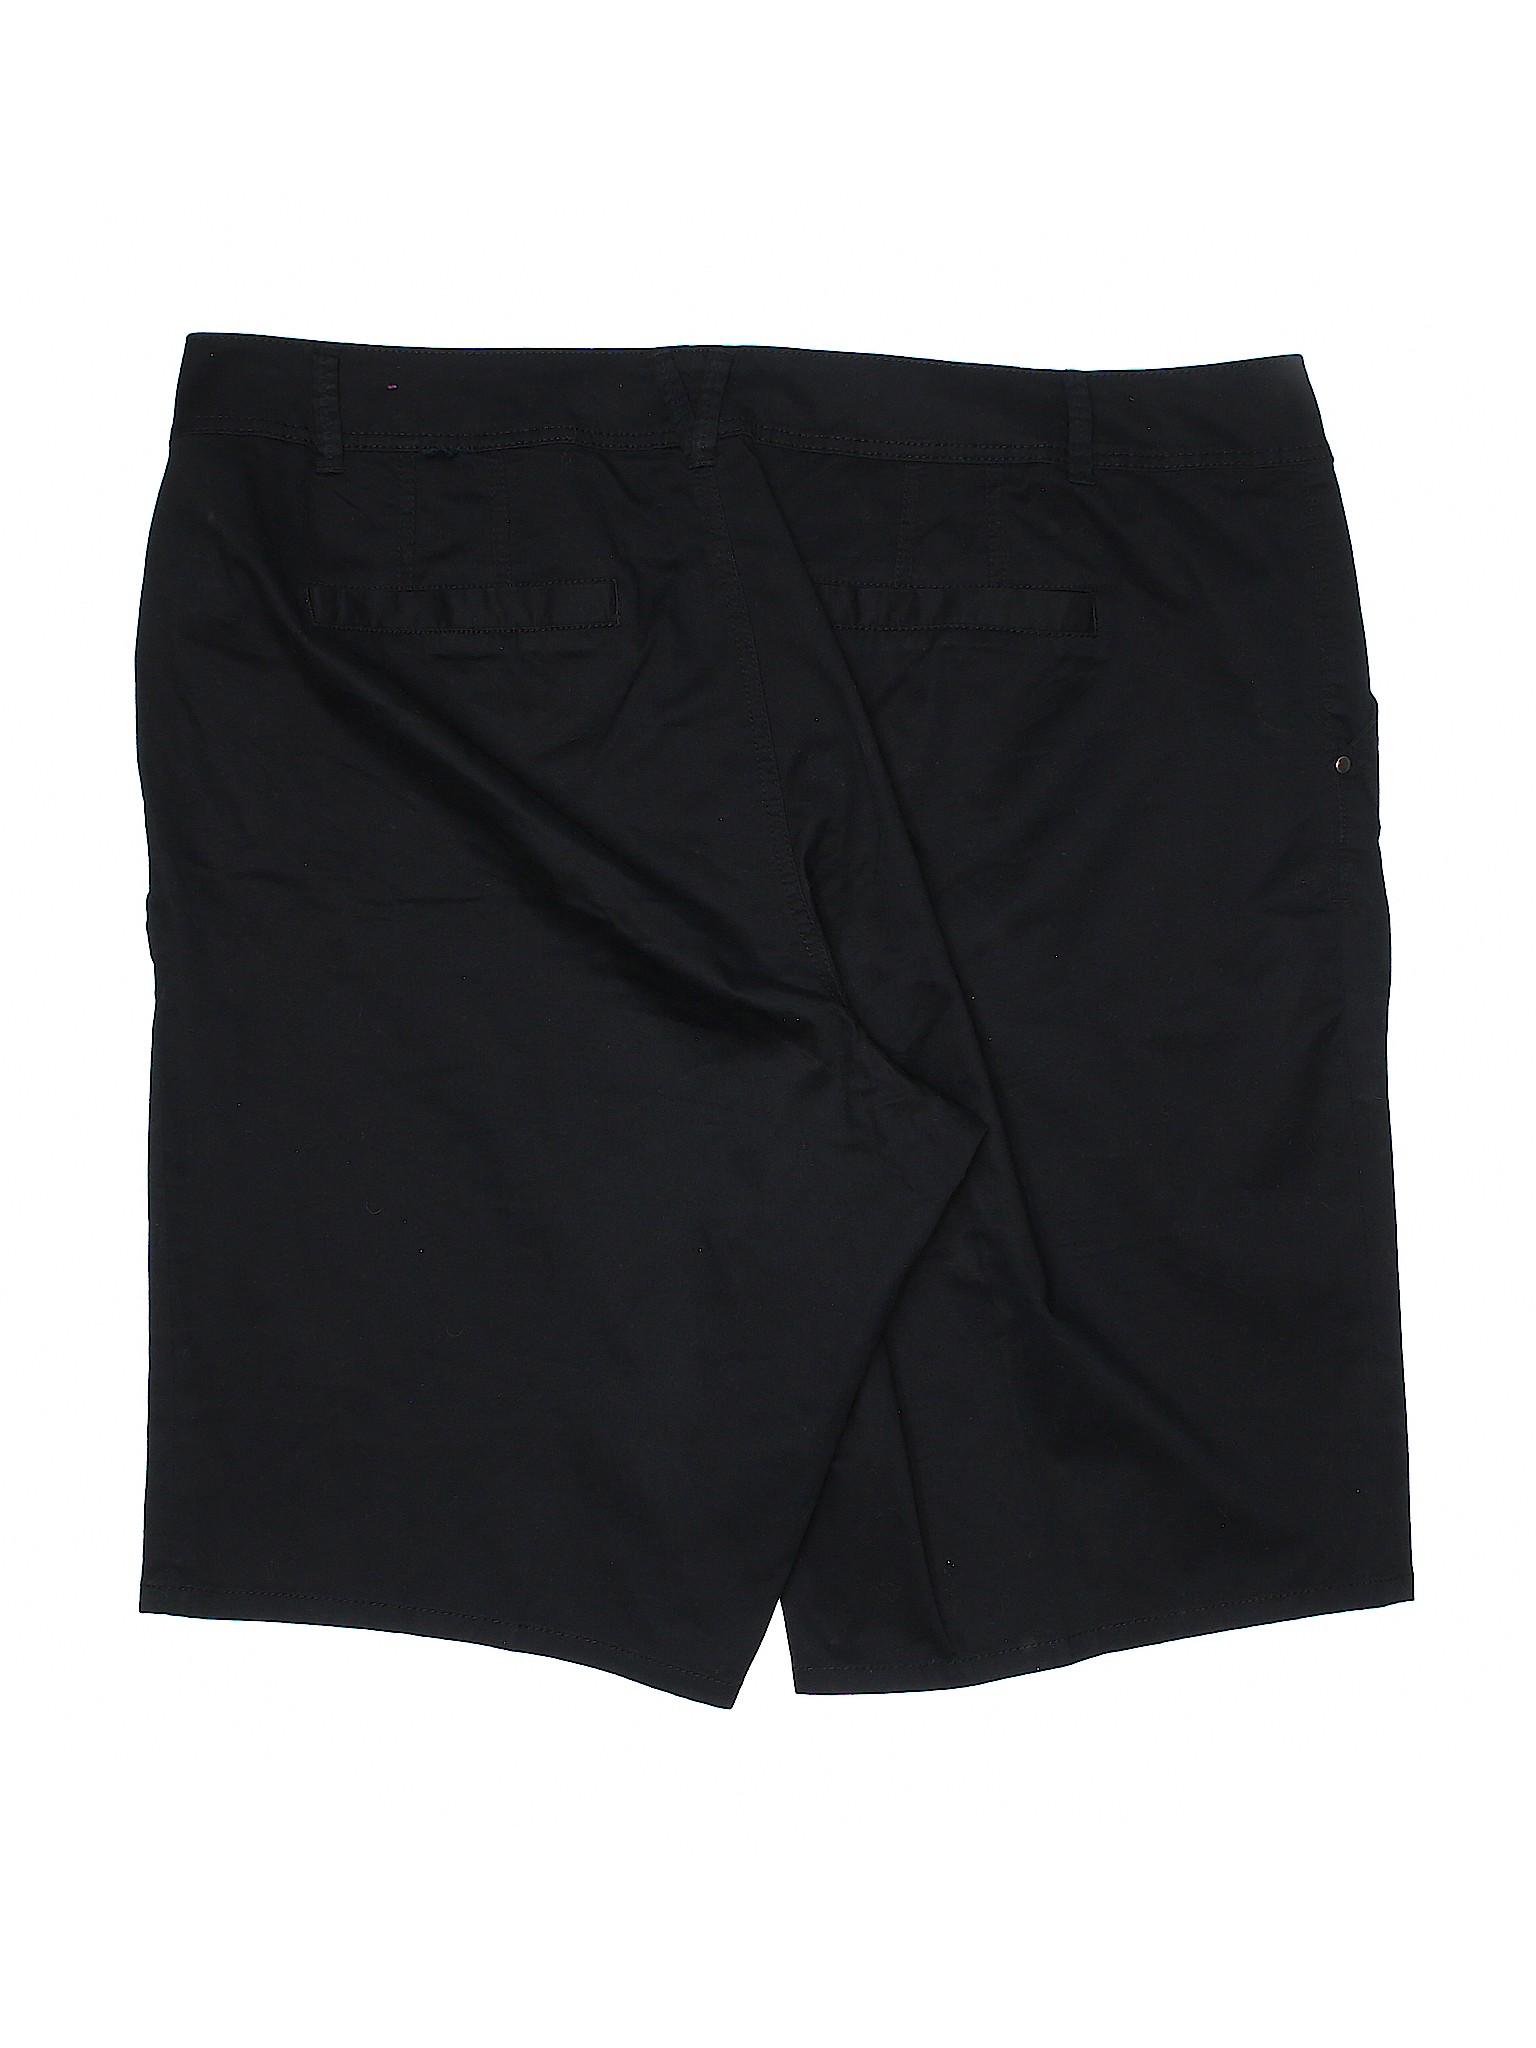 Bryant Khaki Lane Boutique leisure Shorts tqYnwnaxEC